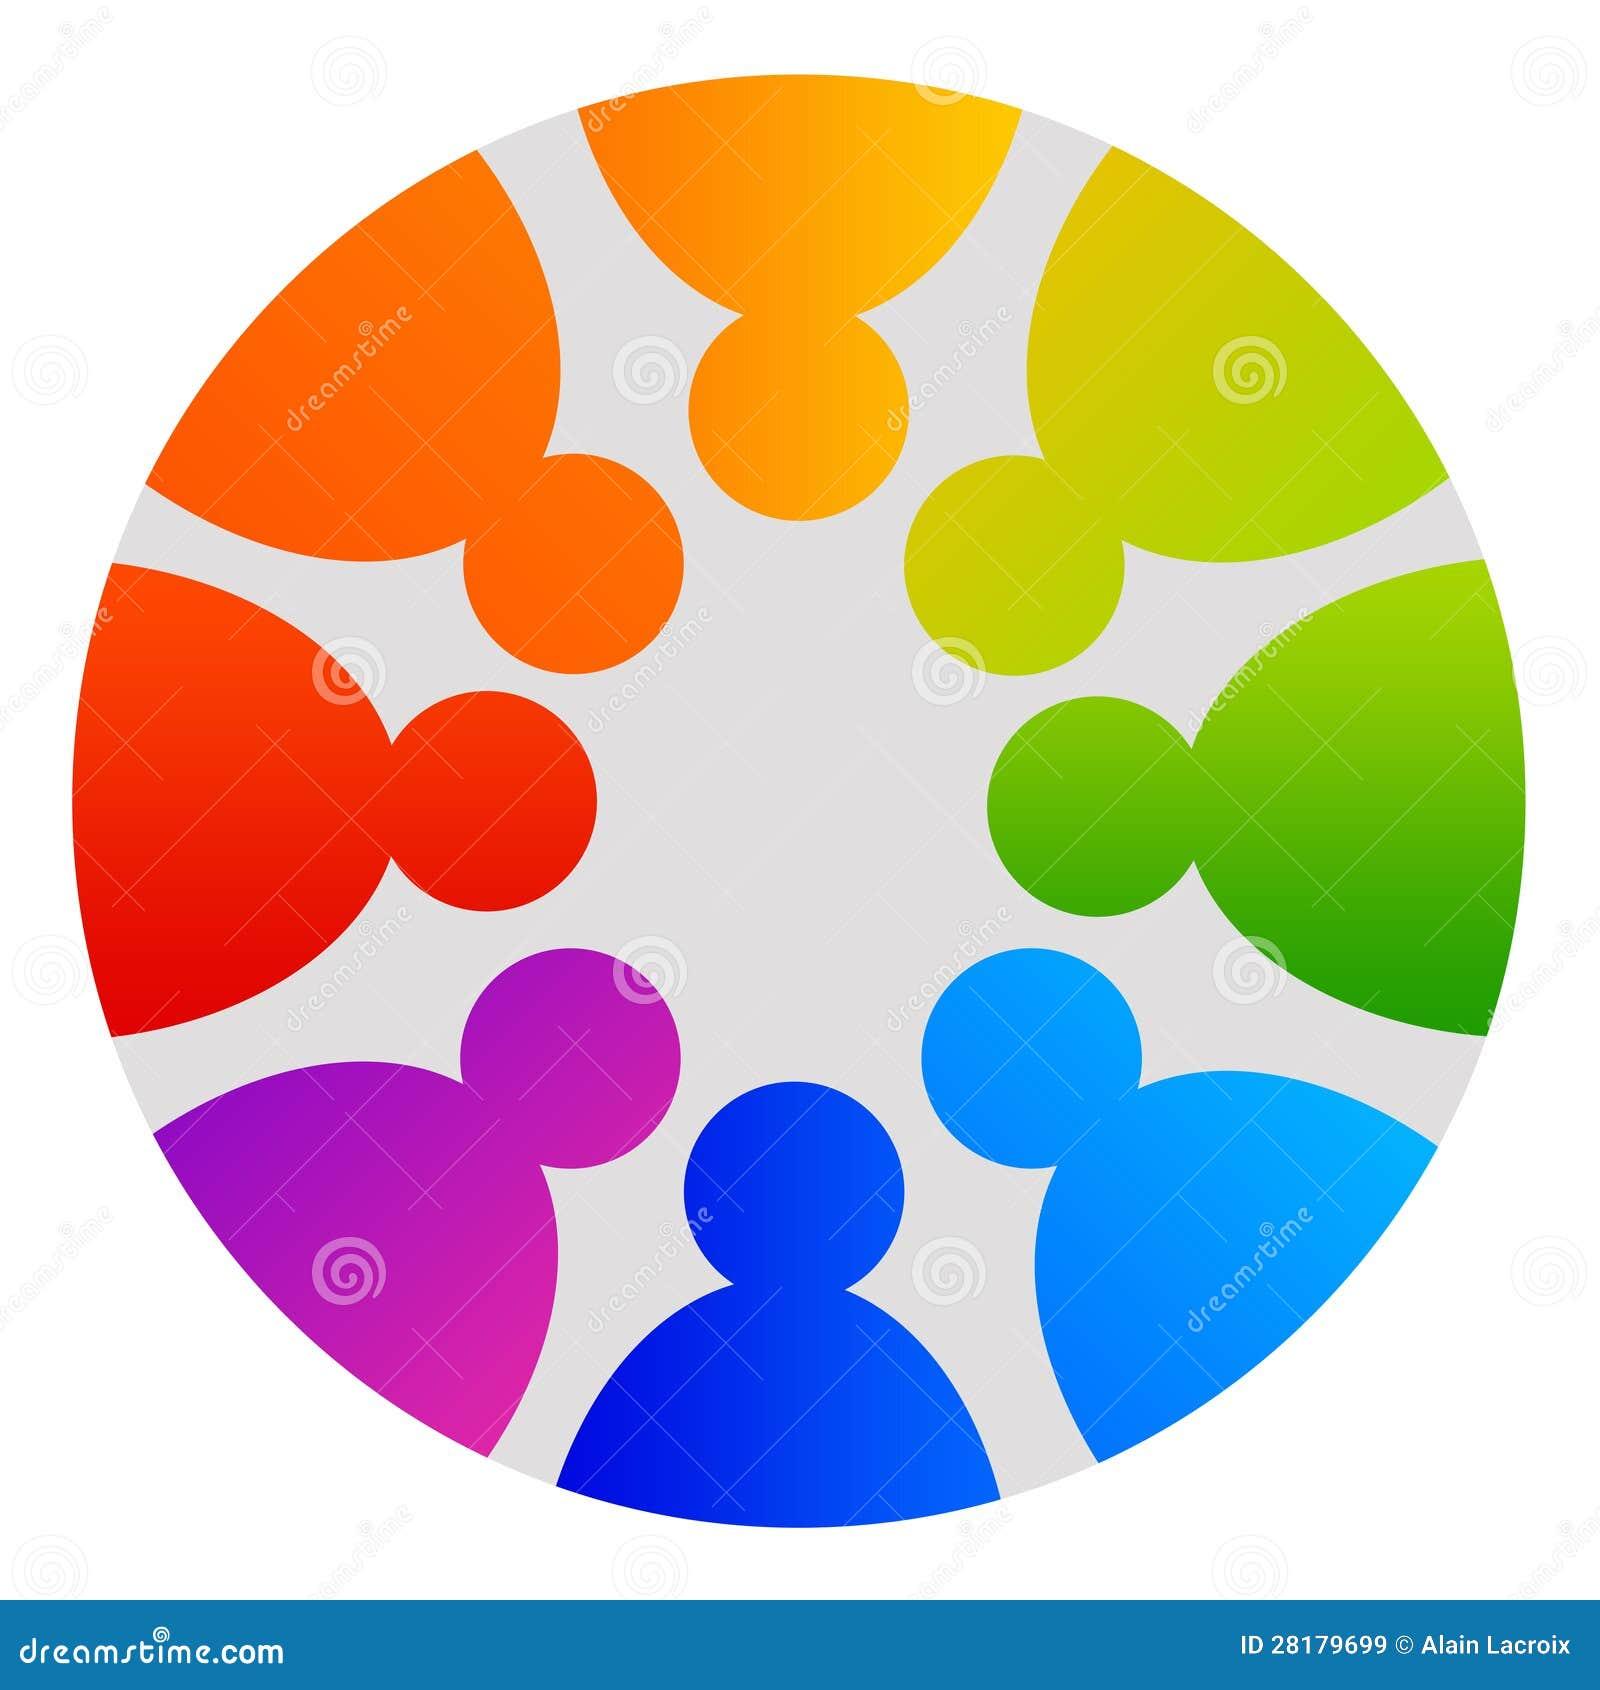 People Circle Royalty Free Stock Images - Image: 28179699